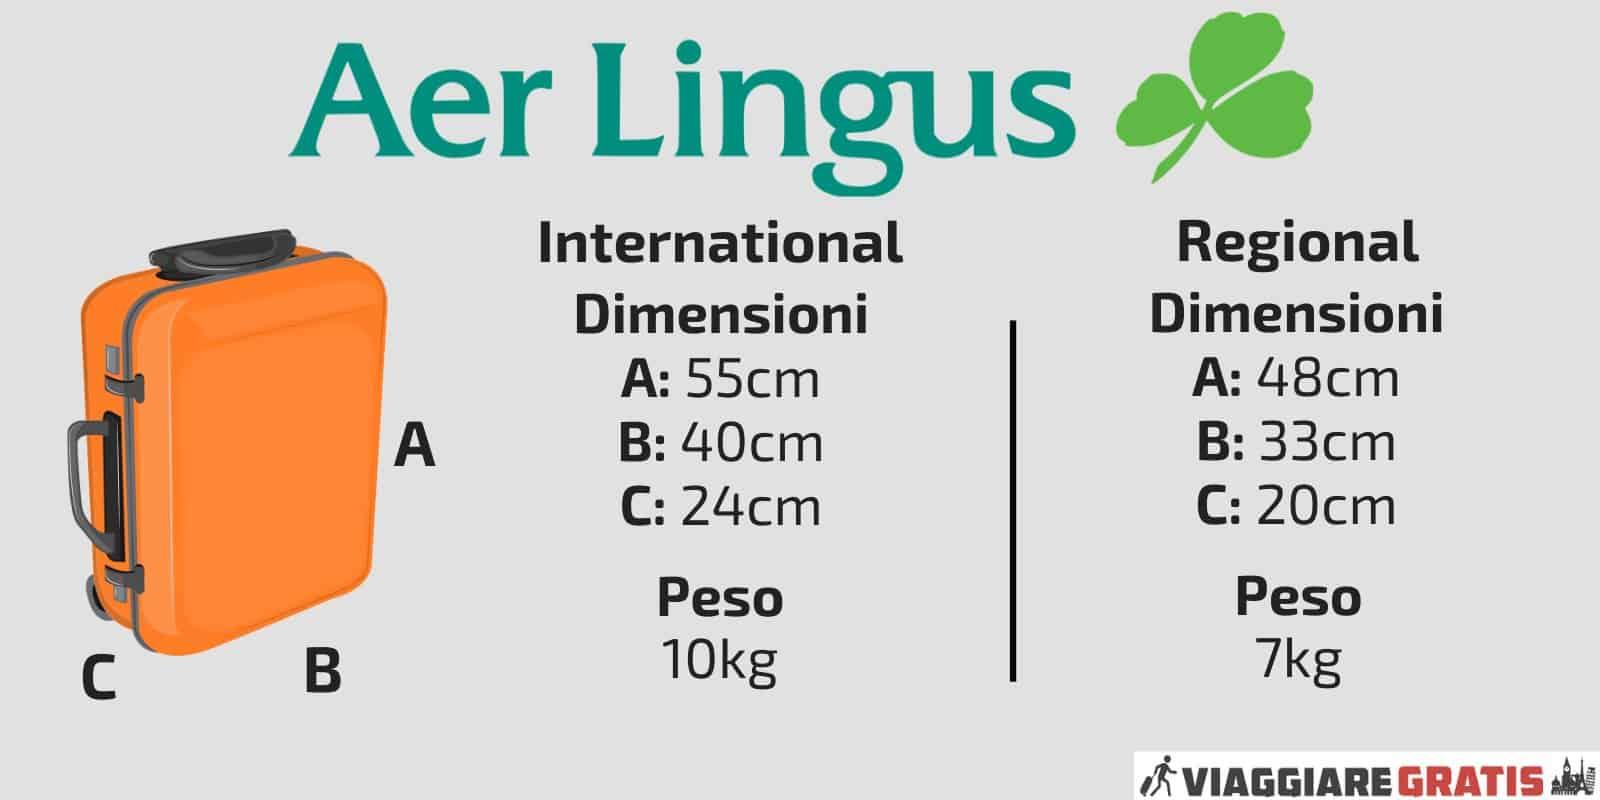 Bagaglio a Mano Aer Lingus